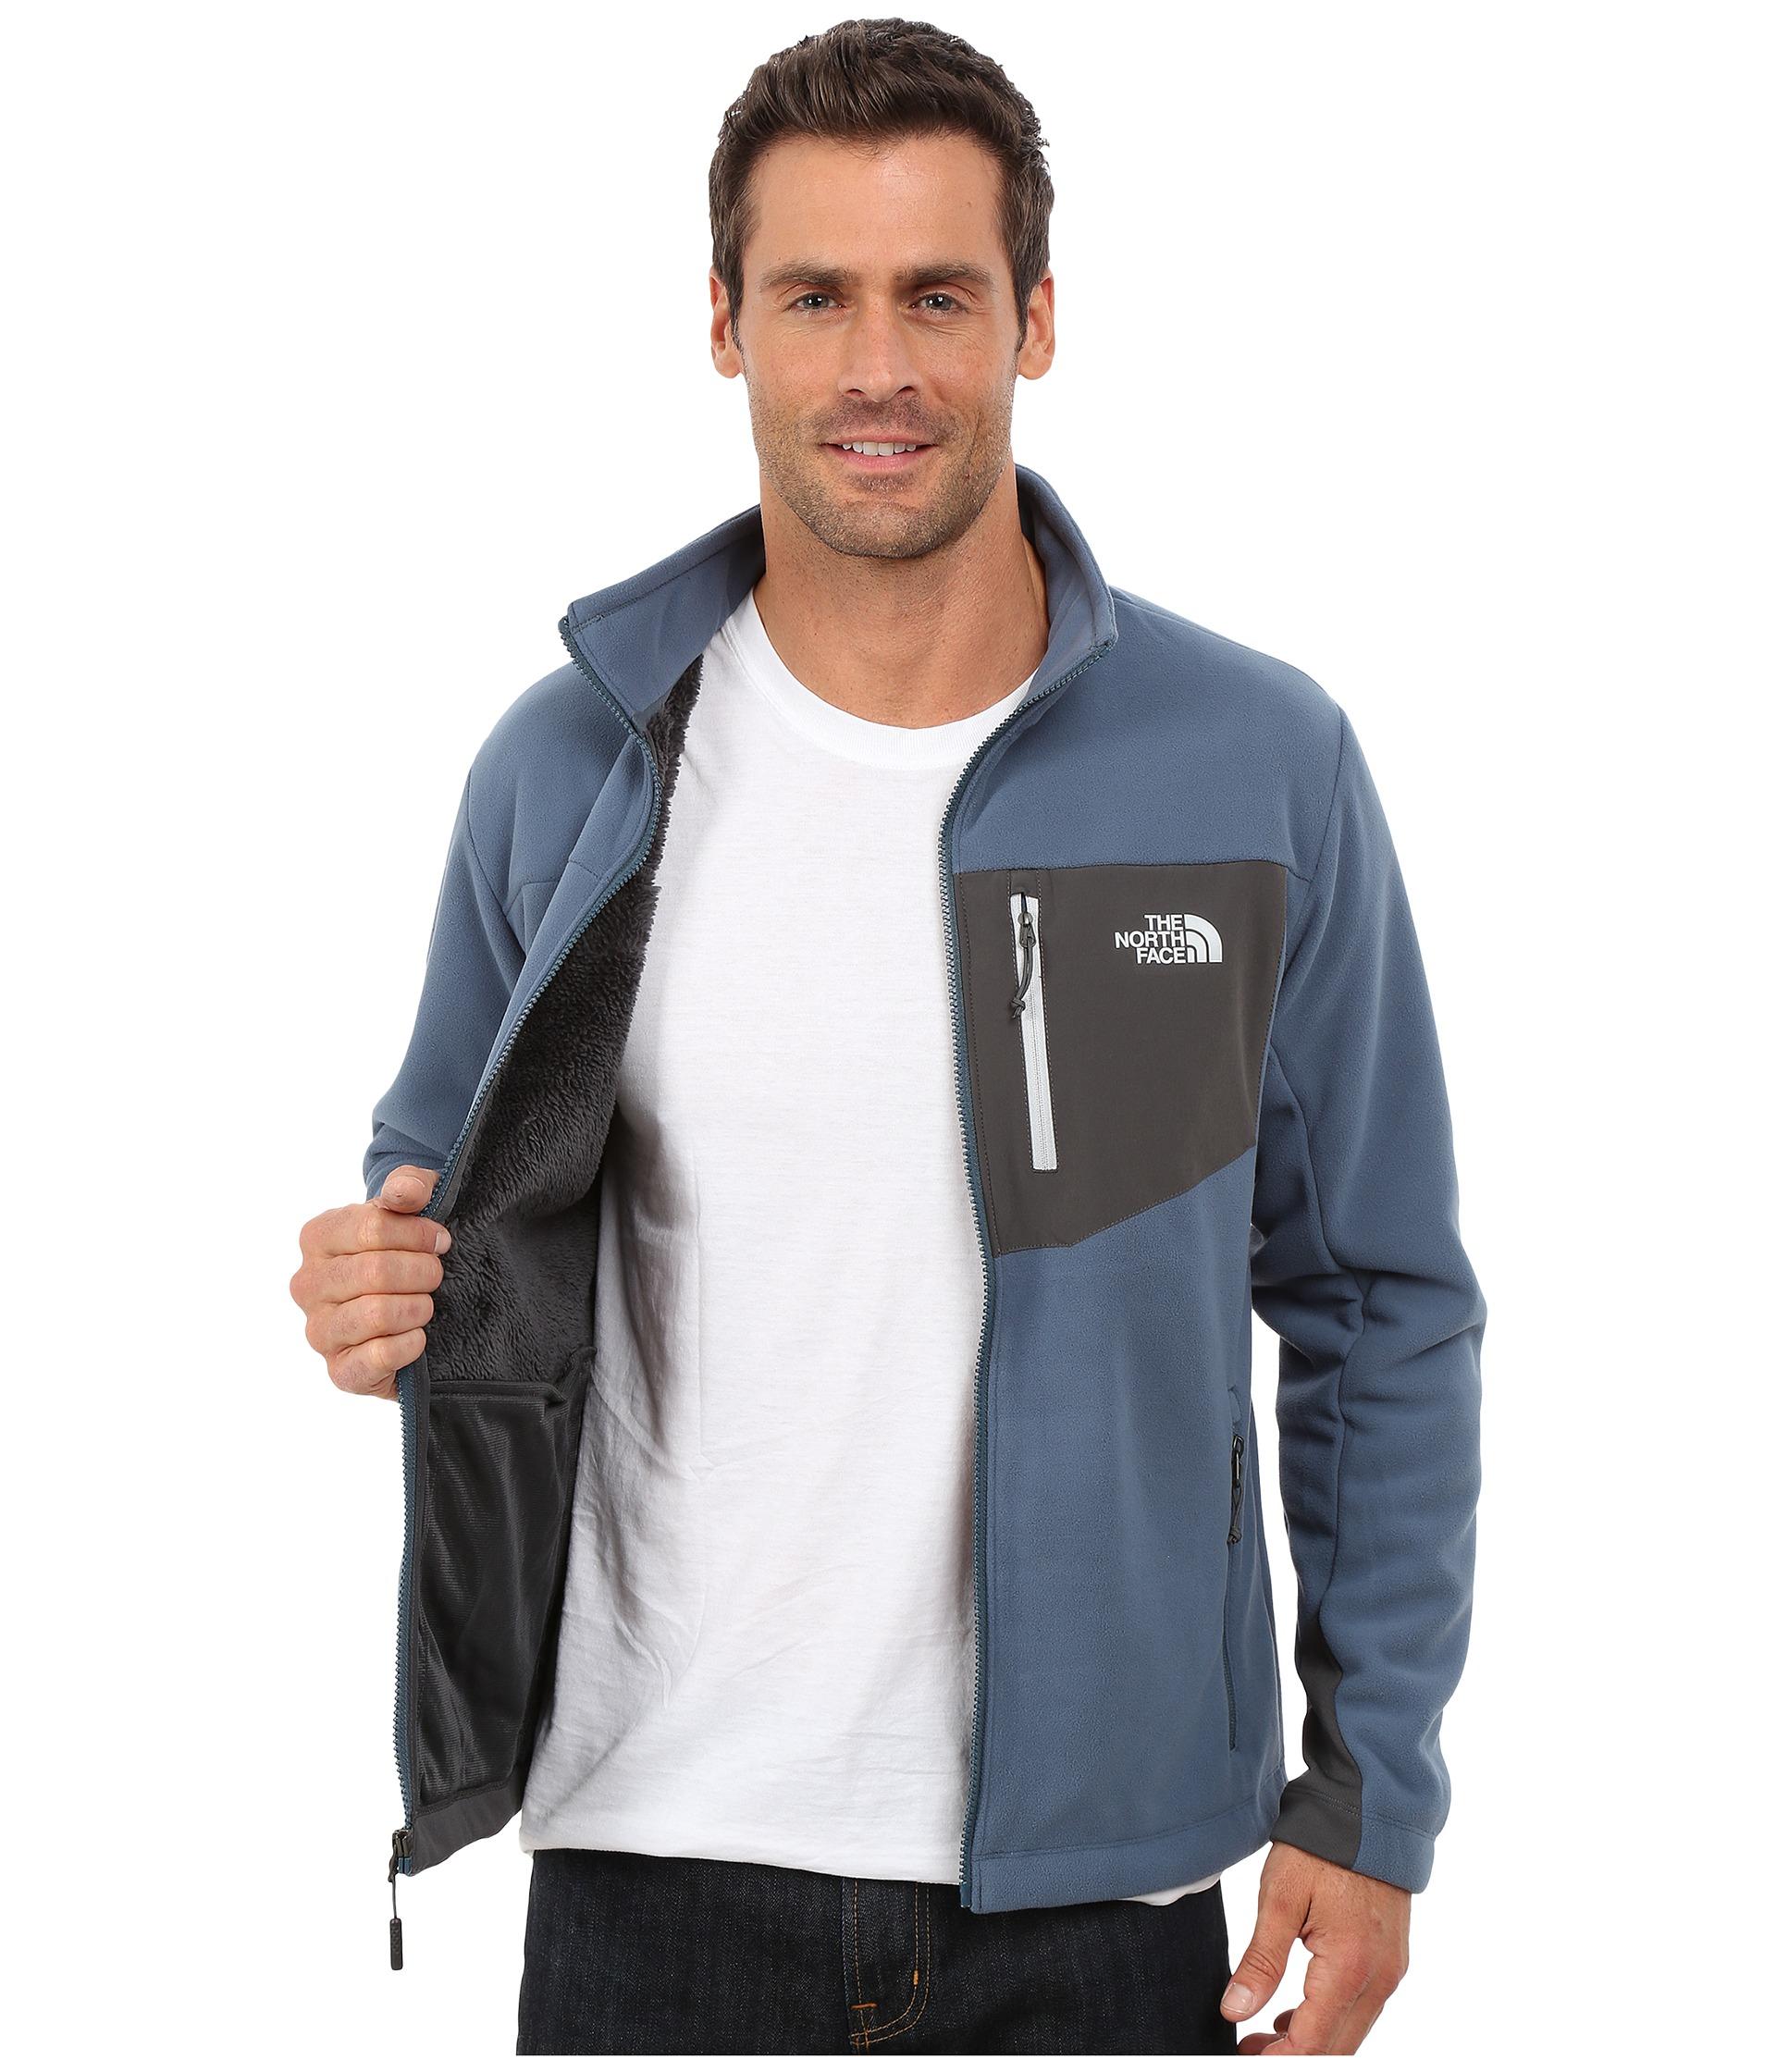 5170a7017cd0 Lyst - The North Face Chimborazo Full Zip Fleece in Blue for Men